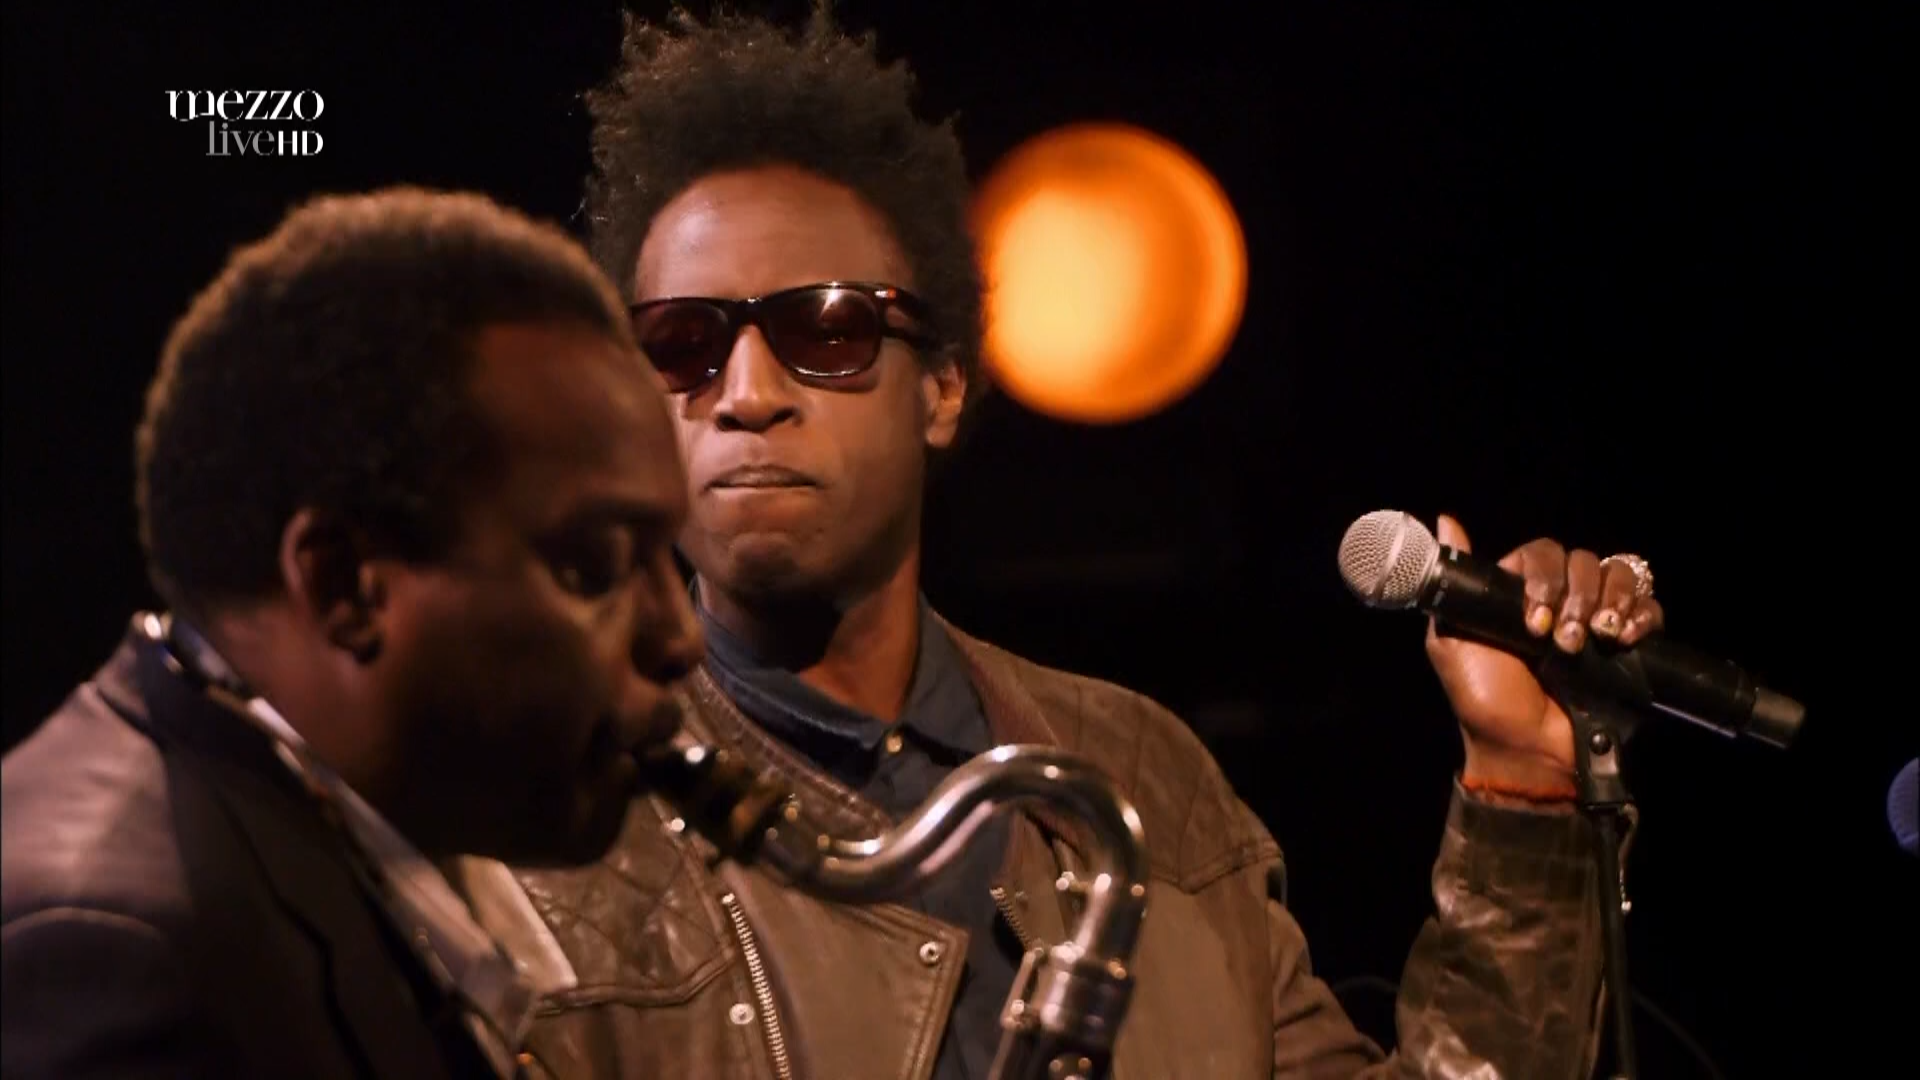 2015 David Murray Infinity Quartet feat. Saul Williams - Disruption at Banlieues Bleues Jazz Fest [HDTV 1080i] 4